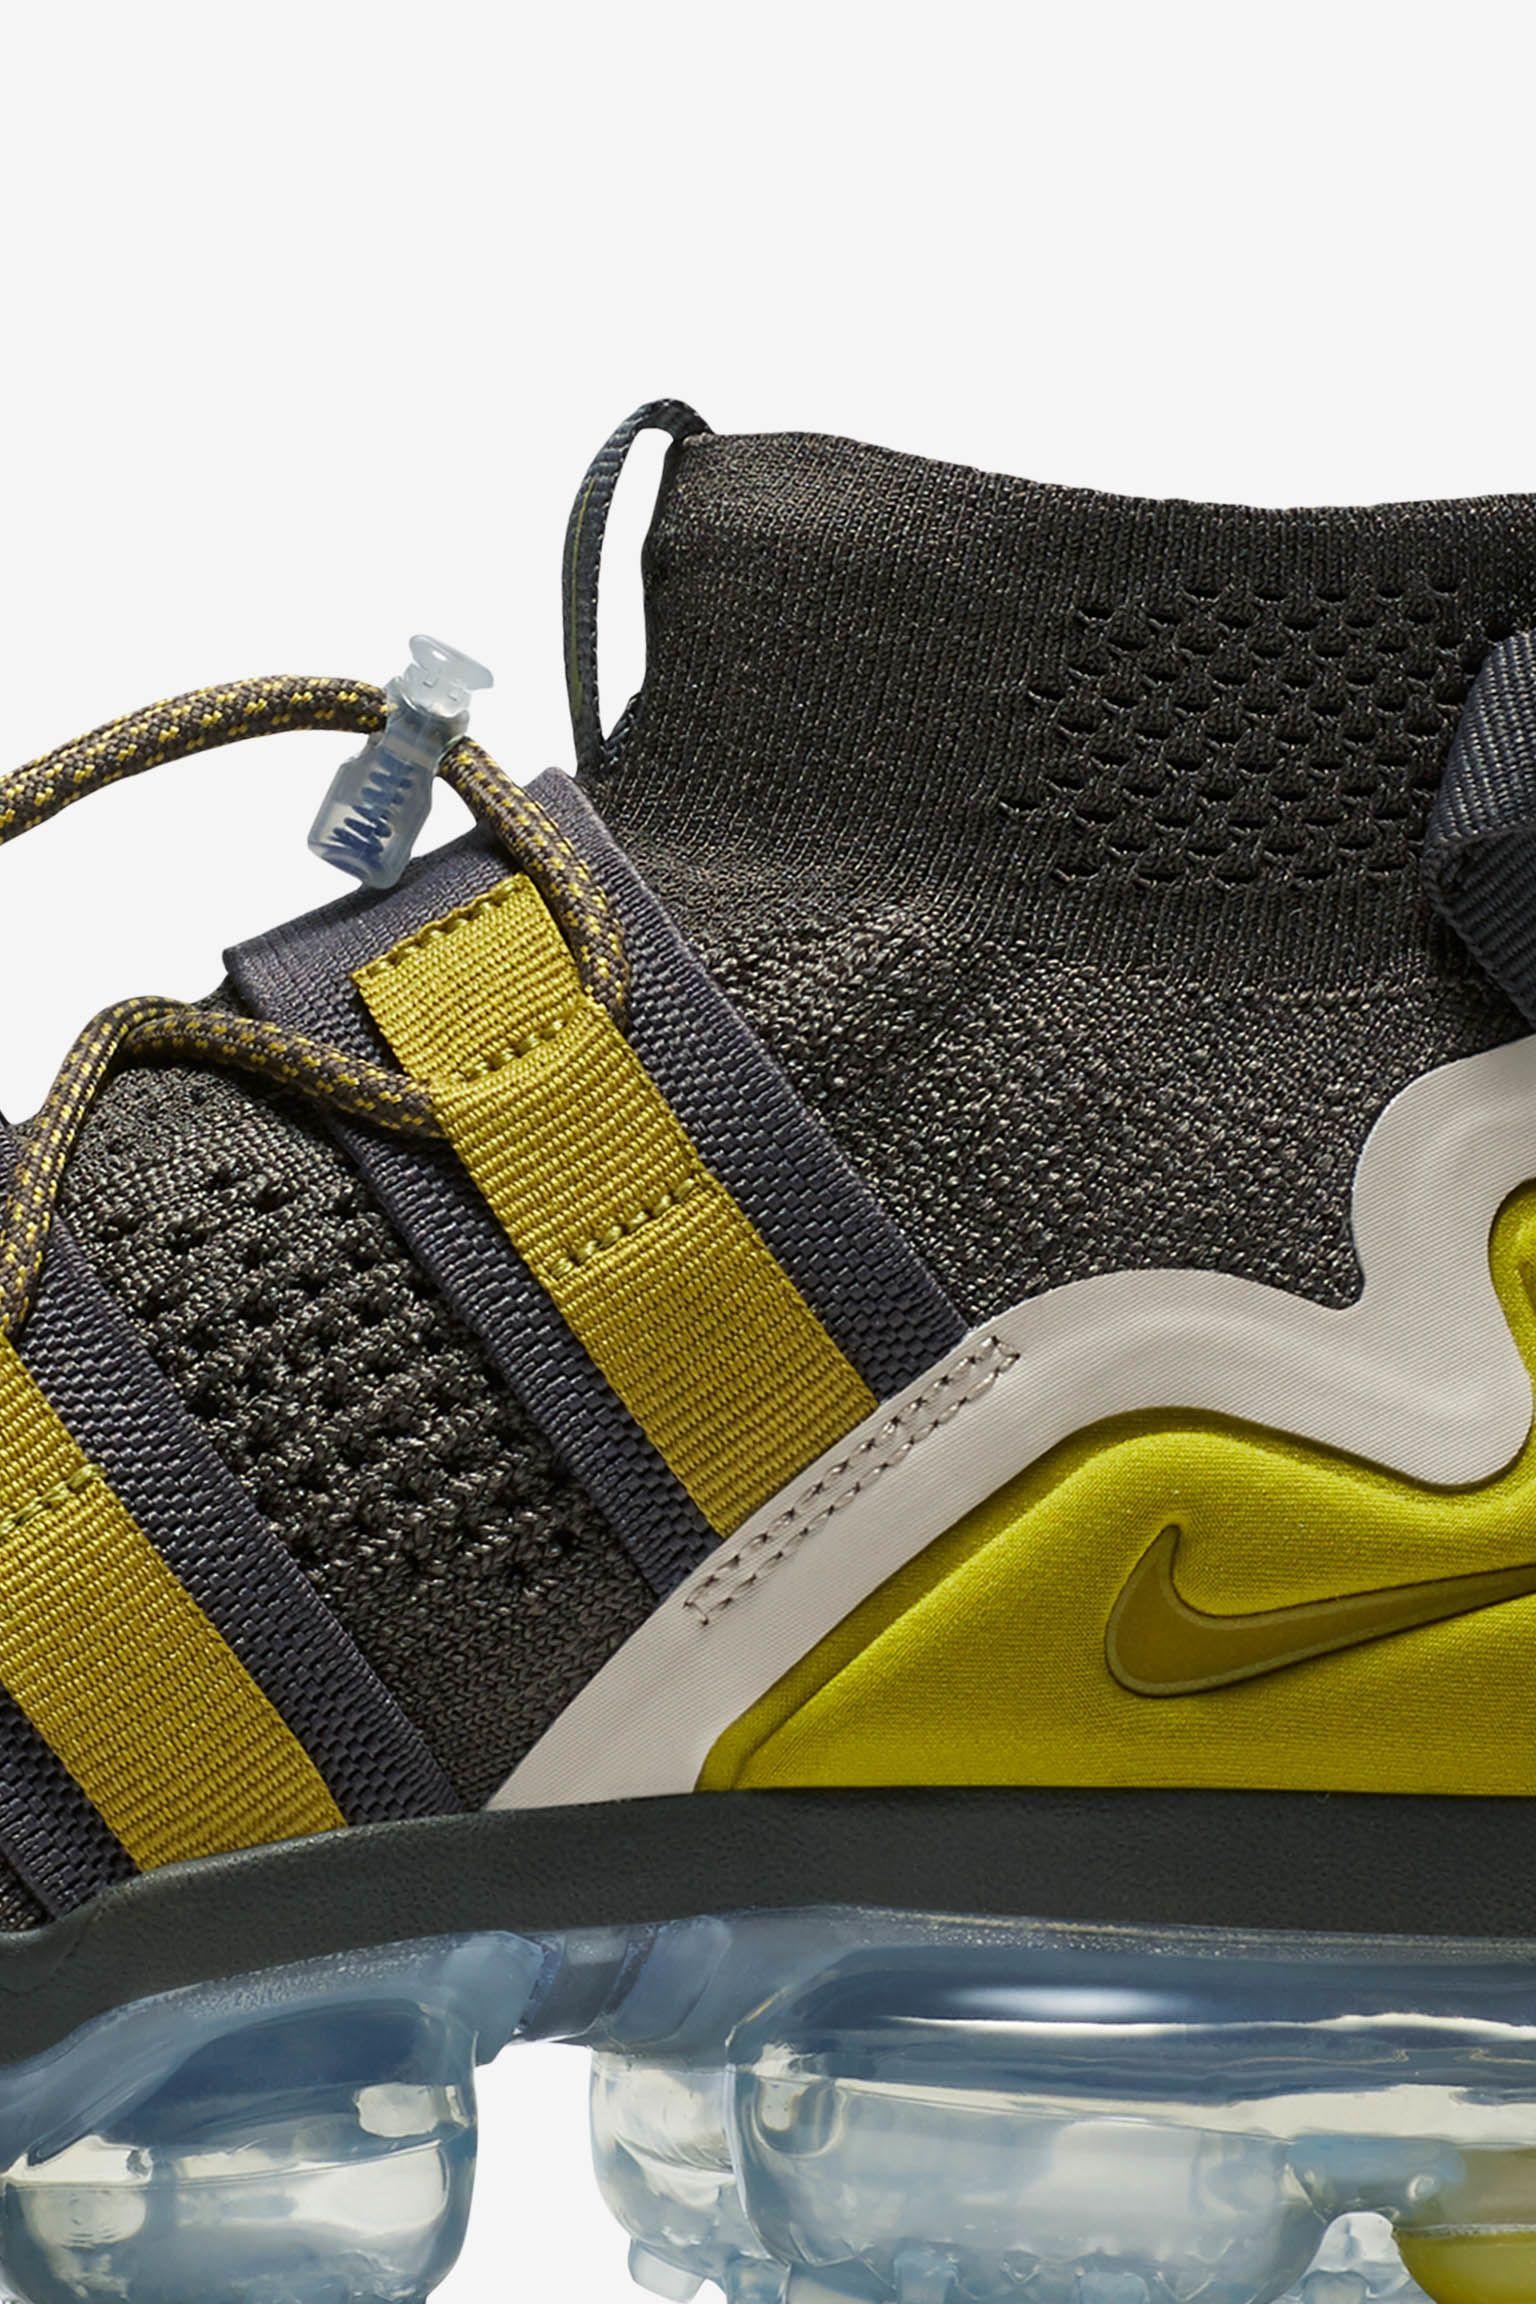 Nike Air Vapormax Utility 'Ridgerock & Peat Moss' Release Date